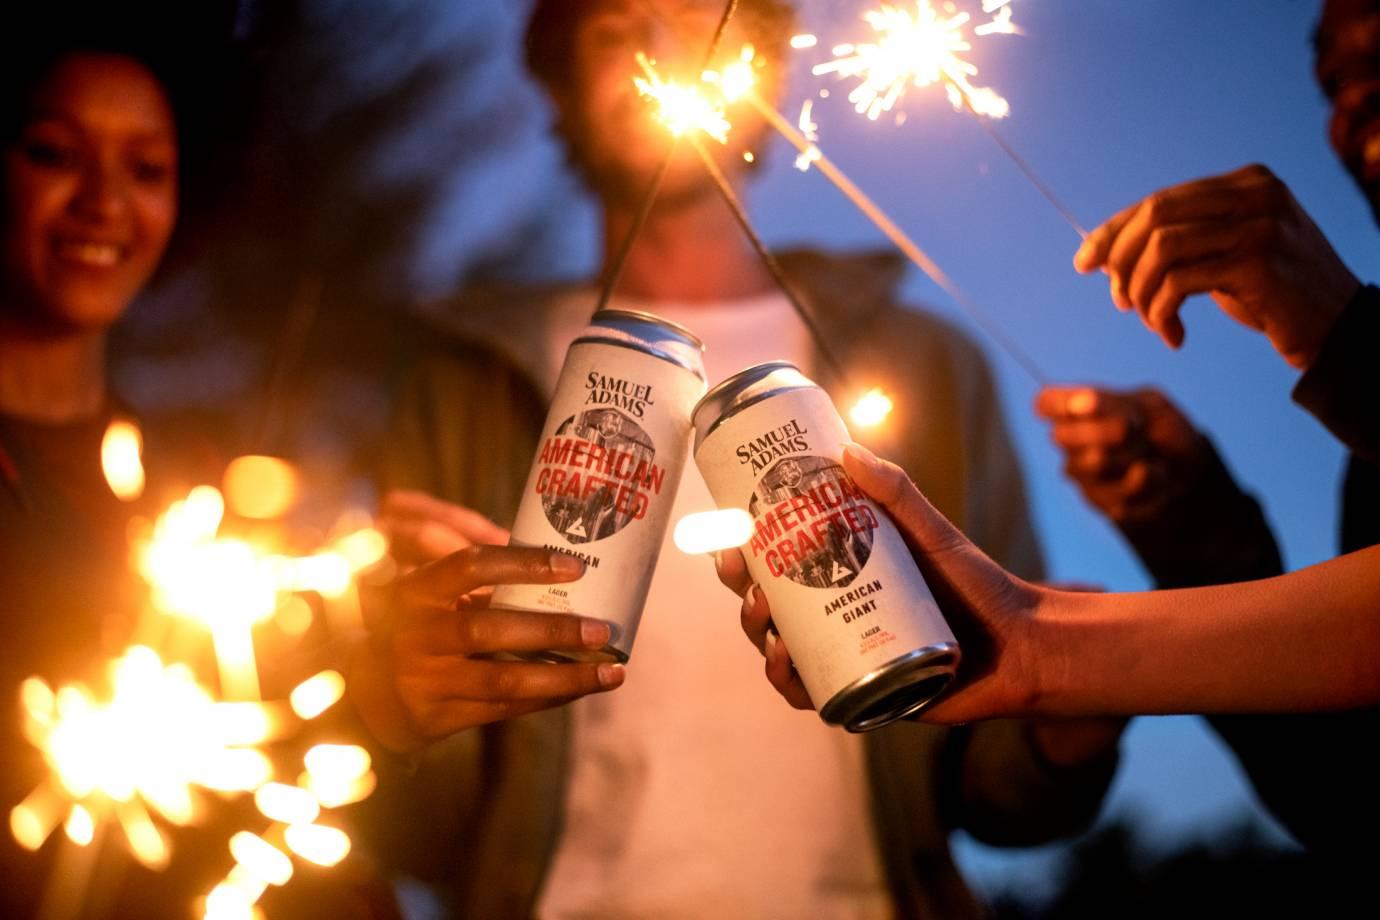 American Giant x Samuel Adams gear beer collab